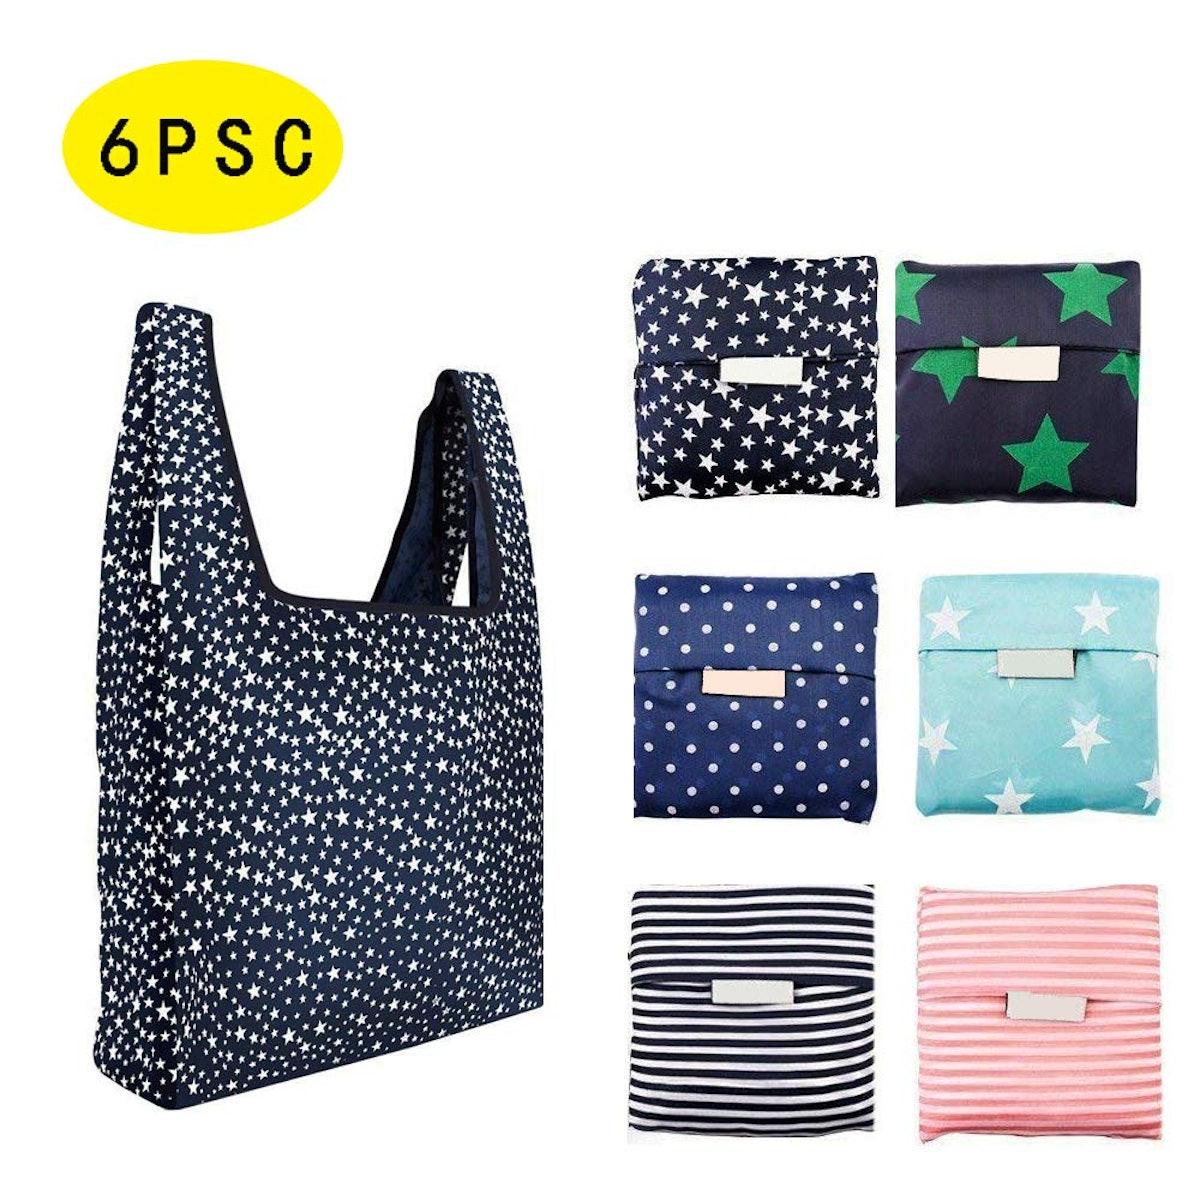 Huangchao Reusable Shopping Bags (6 Bags)